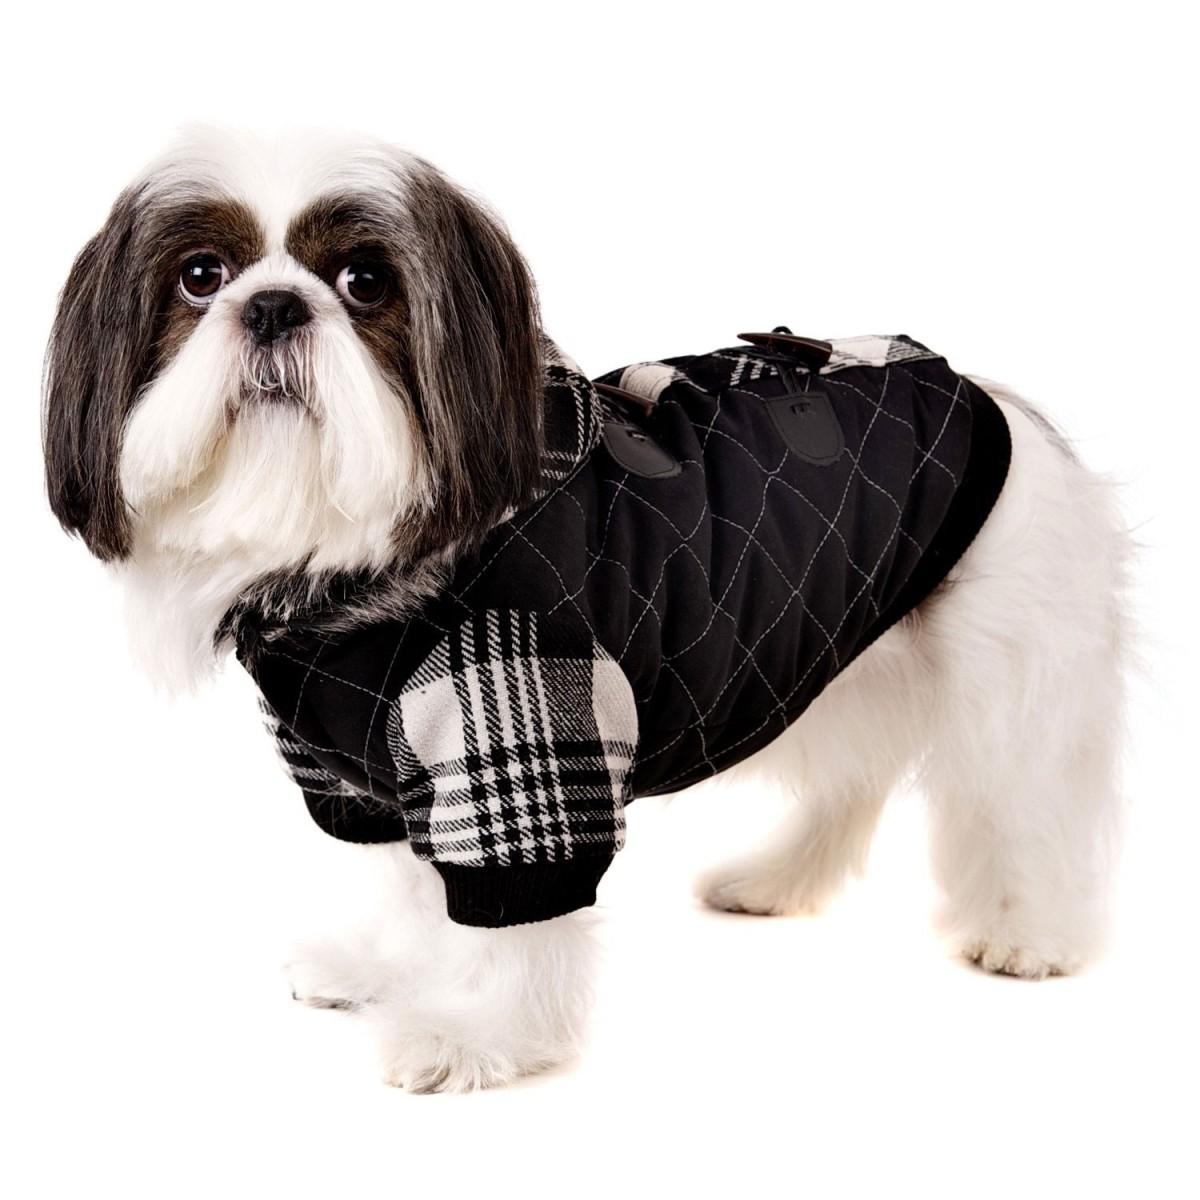 Luxury Leather Coat (Image: petticoats.com)